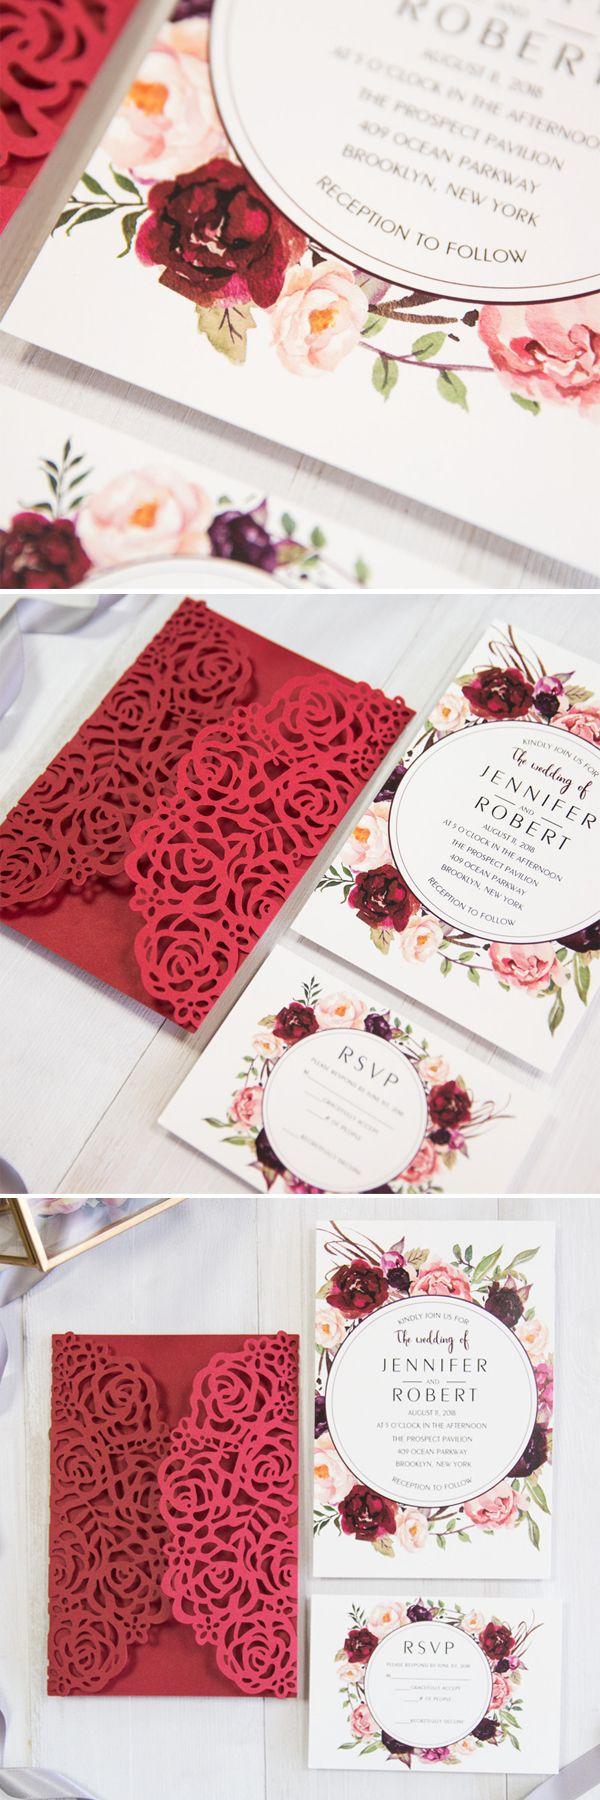 pink and gold wedding invitation kits%0A hot red laser cut wedding invitation with burgundy flower